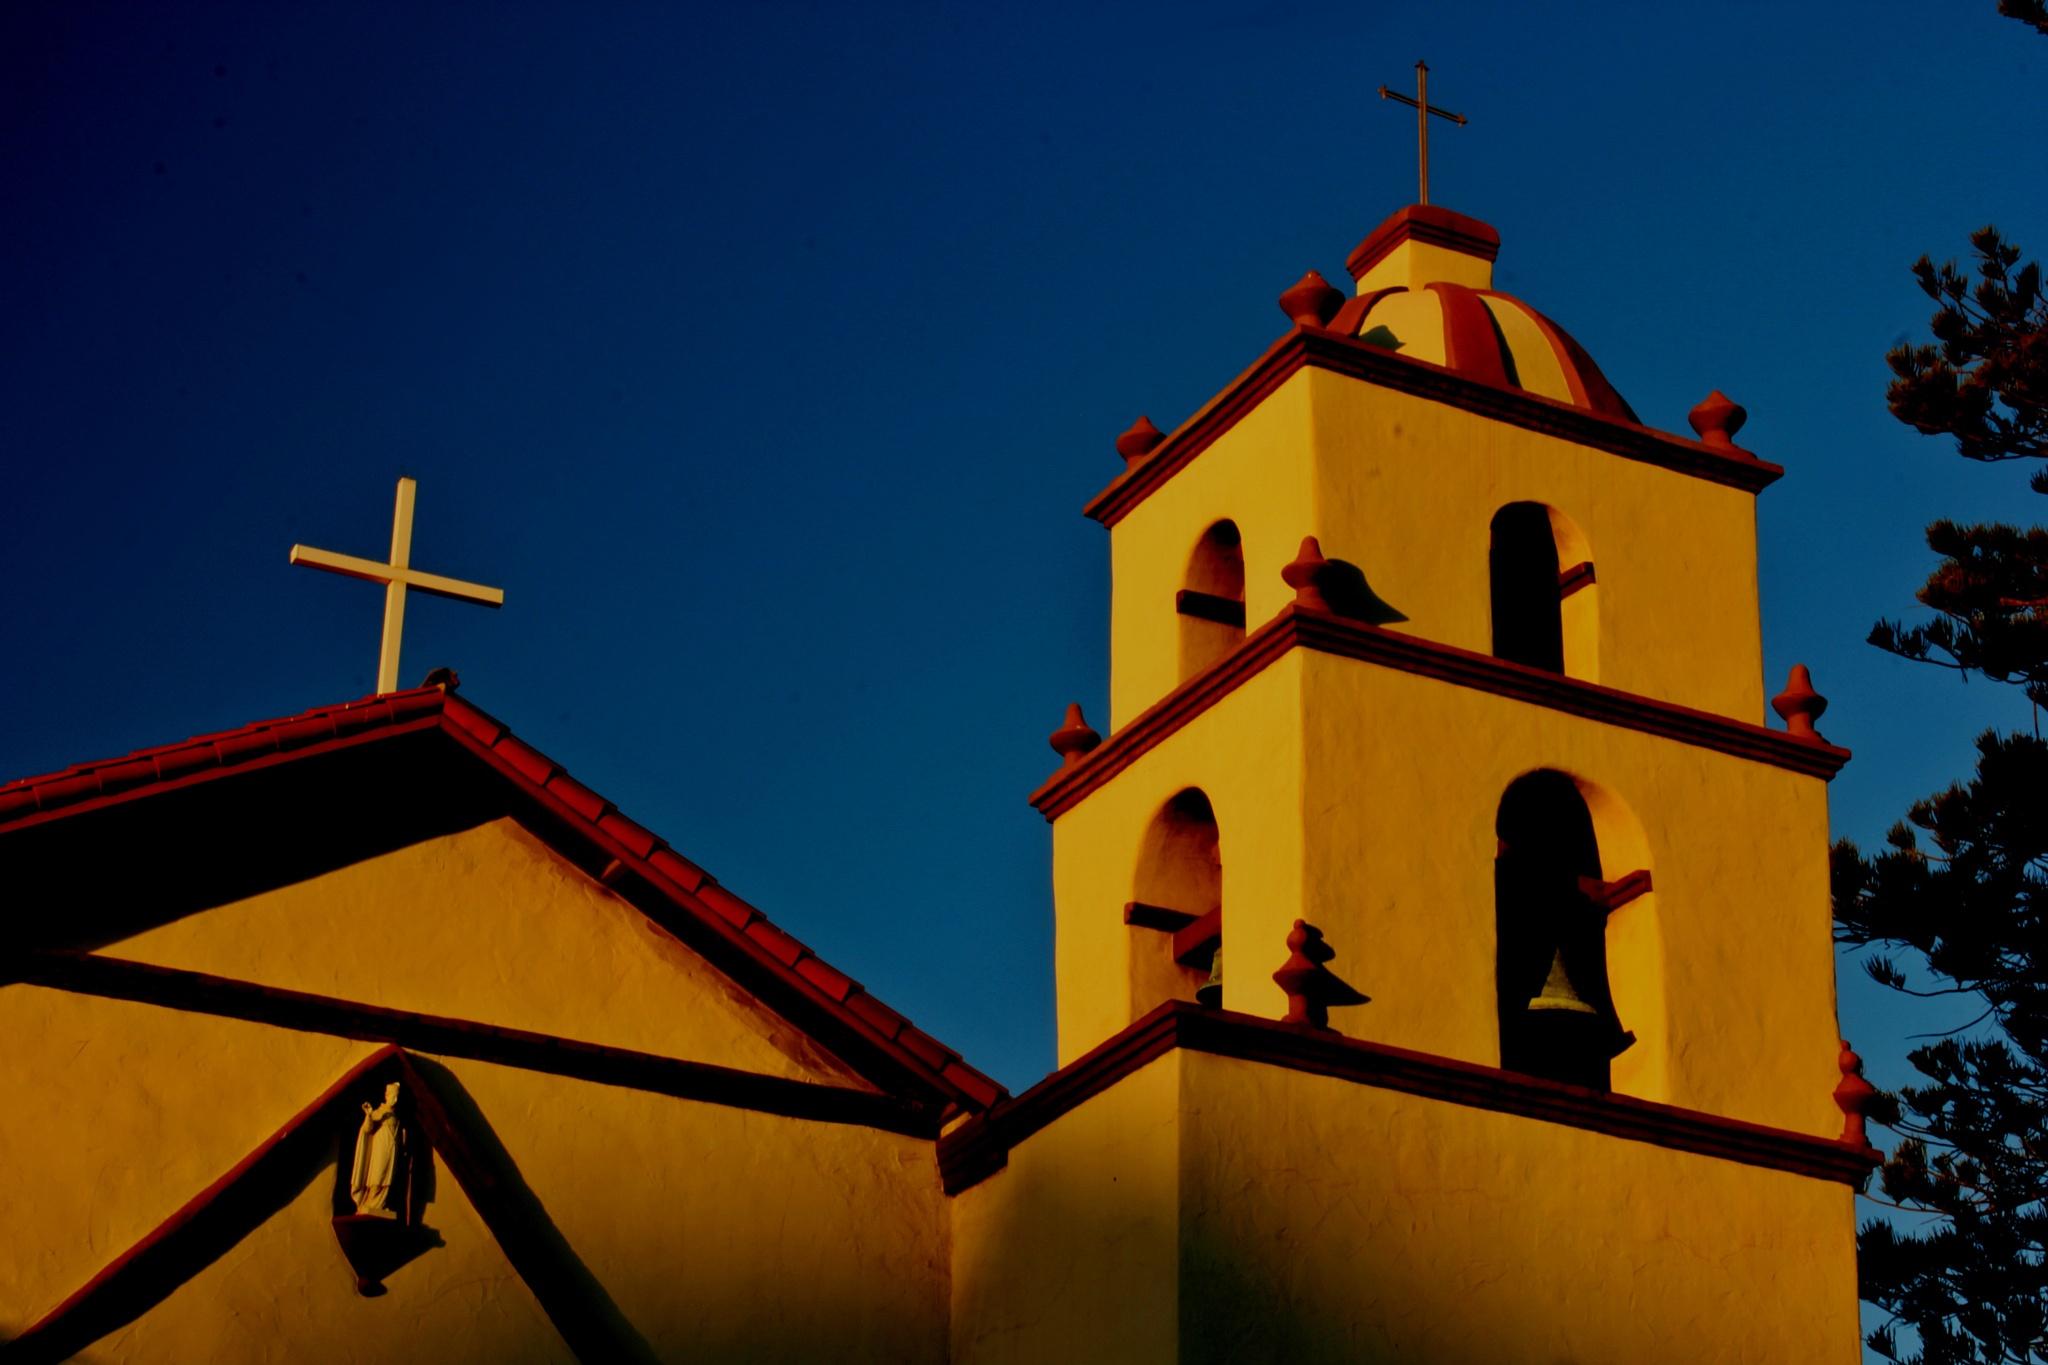 The bell tower by Tiffanie Faith Chezum